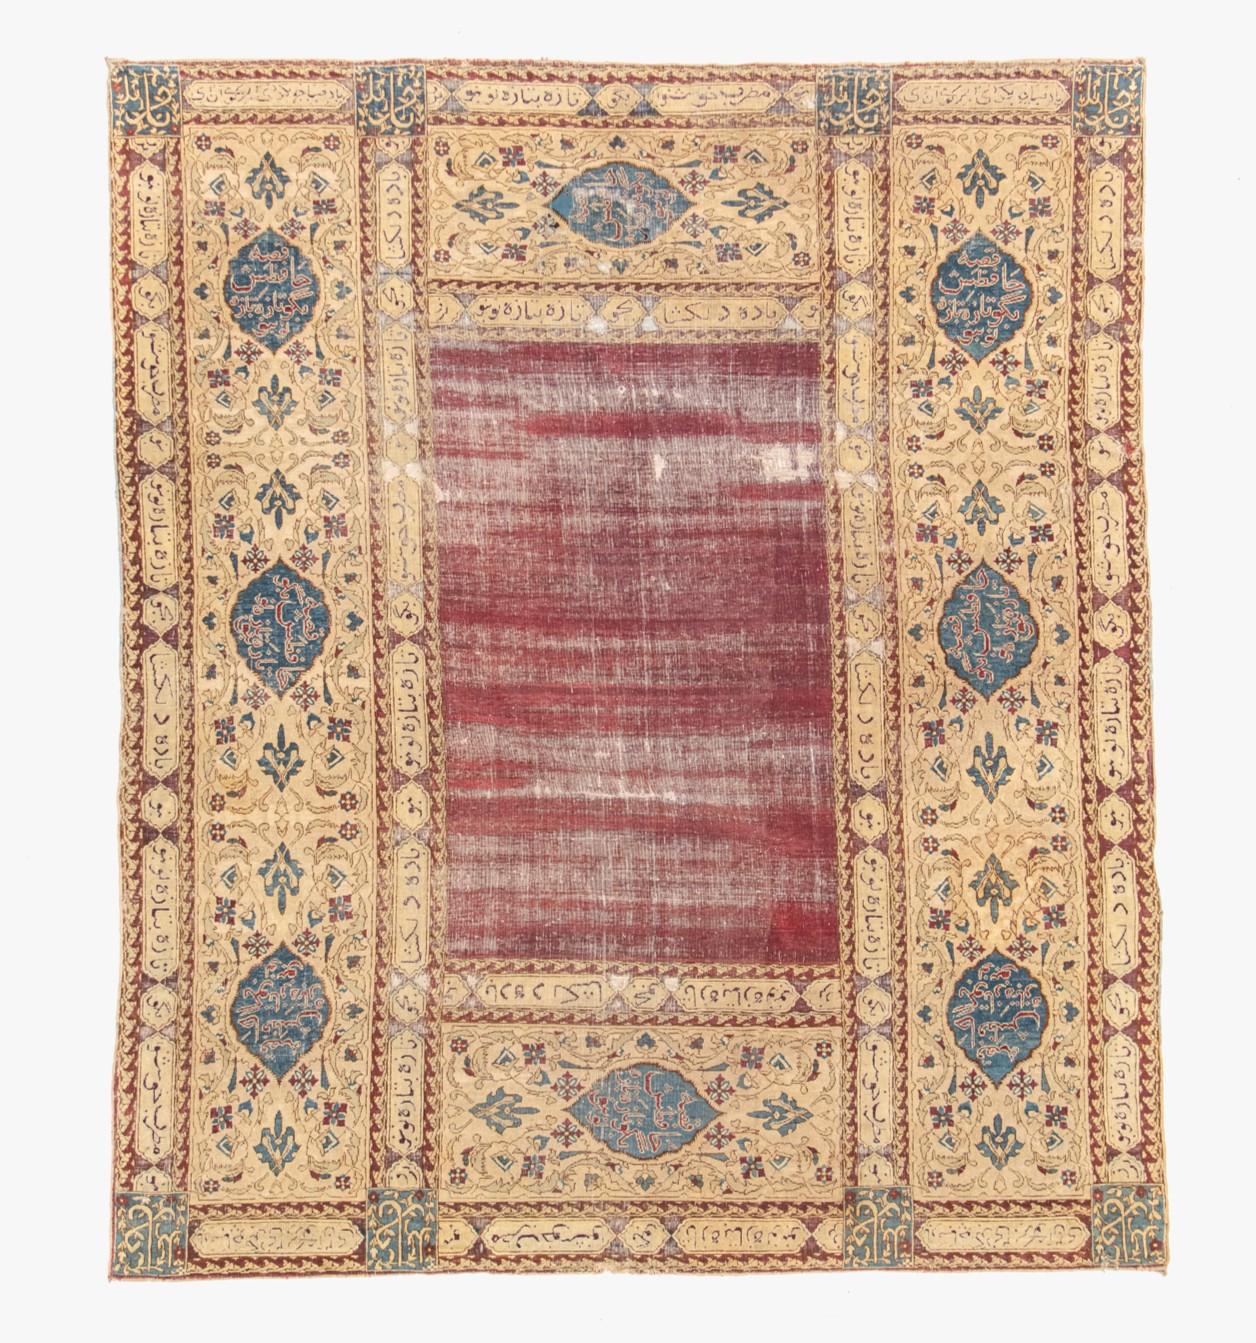 An Indian Amritsar carpet,  India, Circa 1860